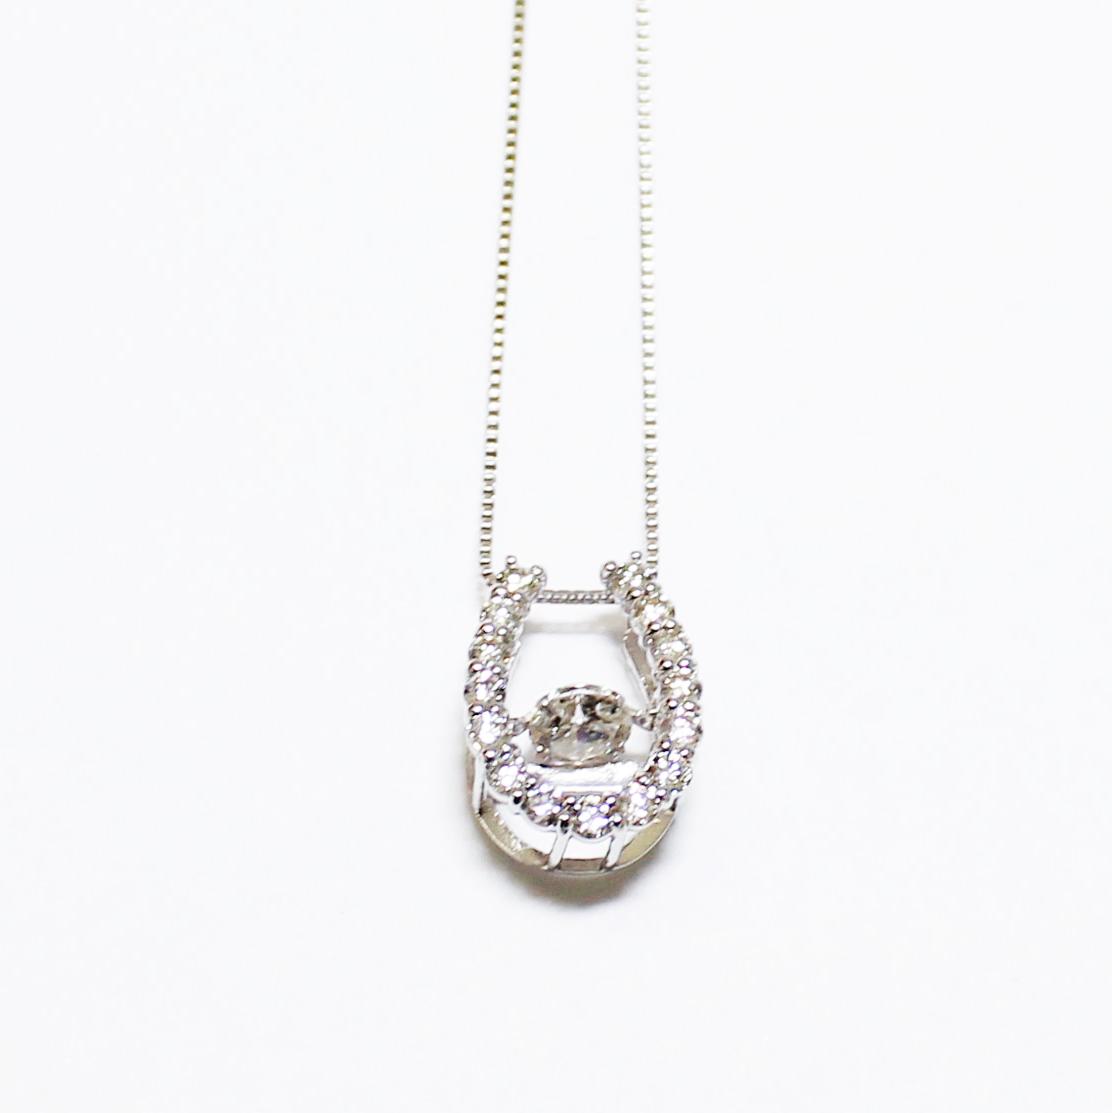 K18WG ダイヤ ダンシングストーン ペンダント ネックレス ダイヤ 0.5ct 馬蹄 ホワイトゴールド【新品】